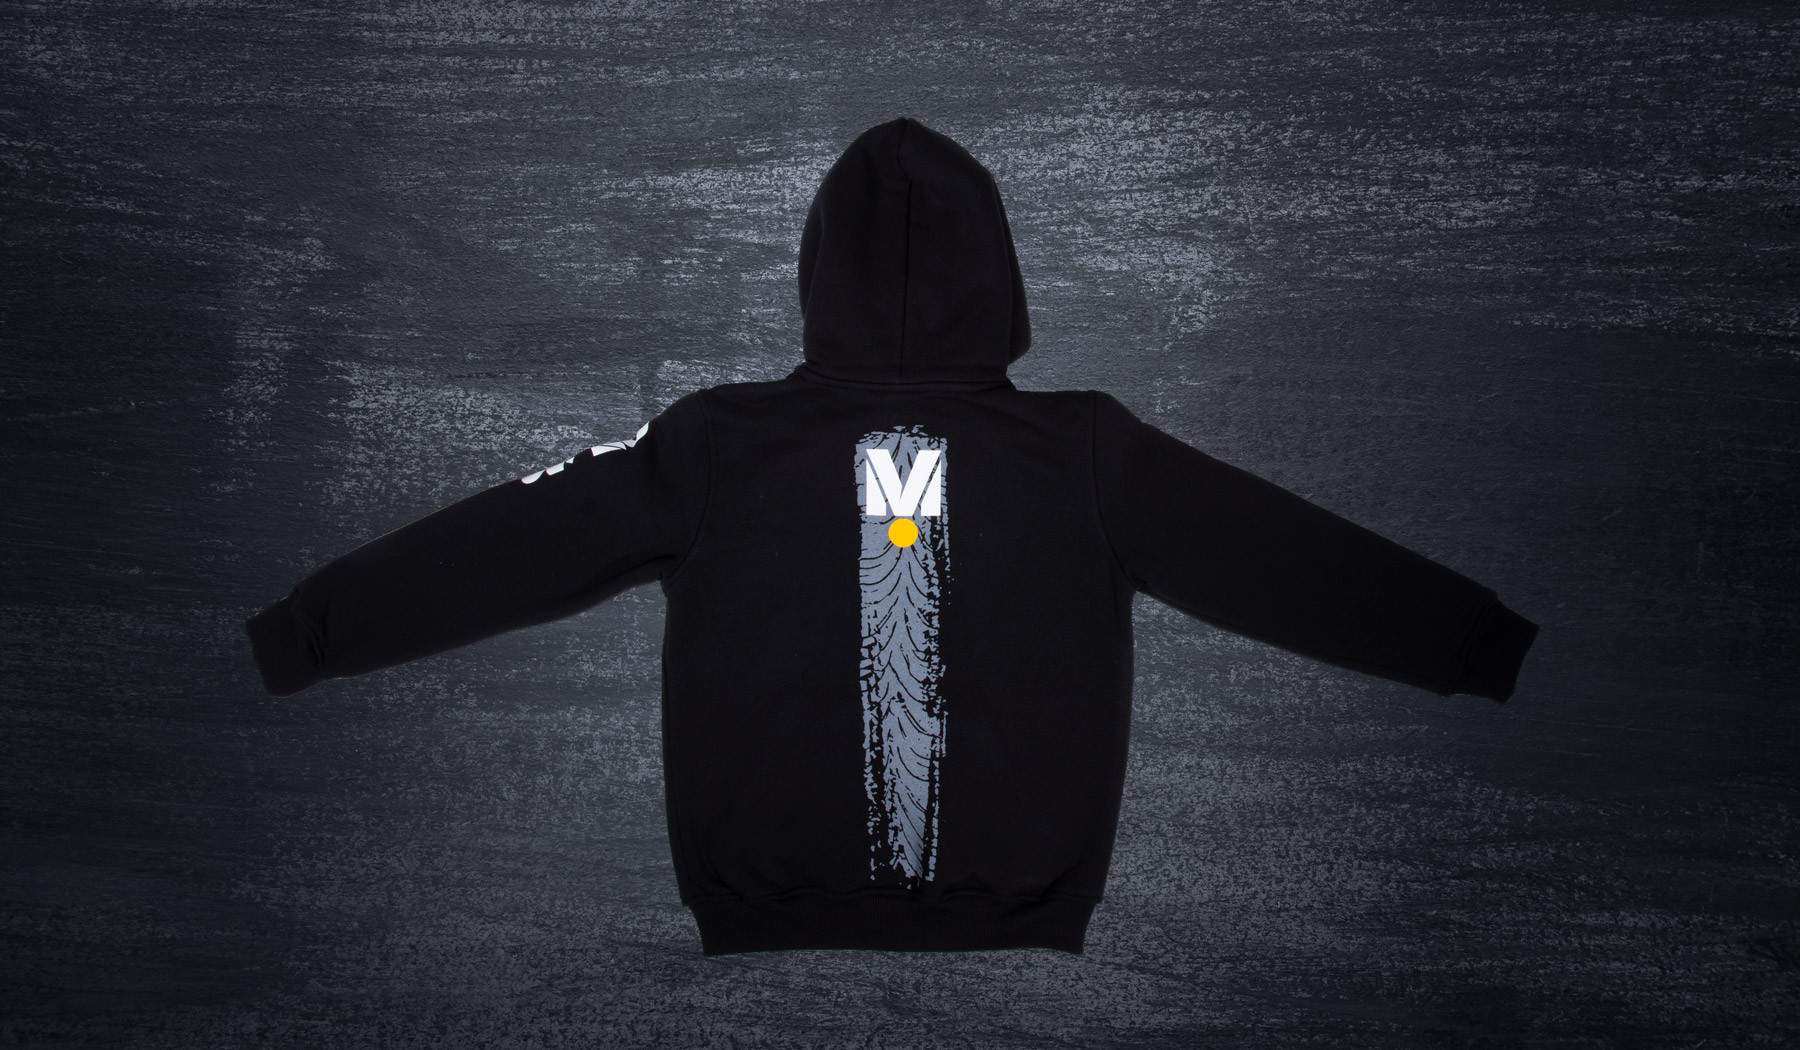 DMEC hooded sweatshirt black/grey tire motif